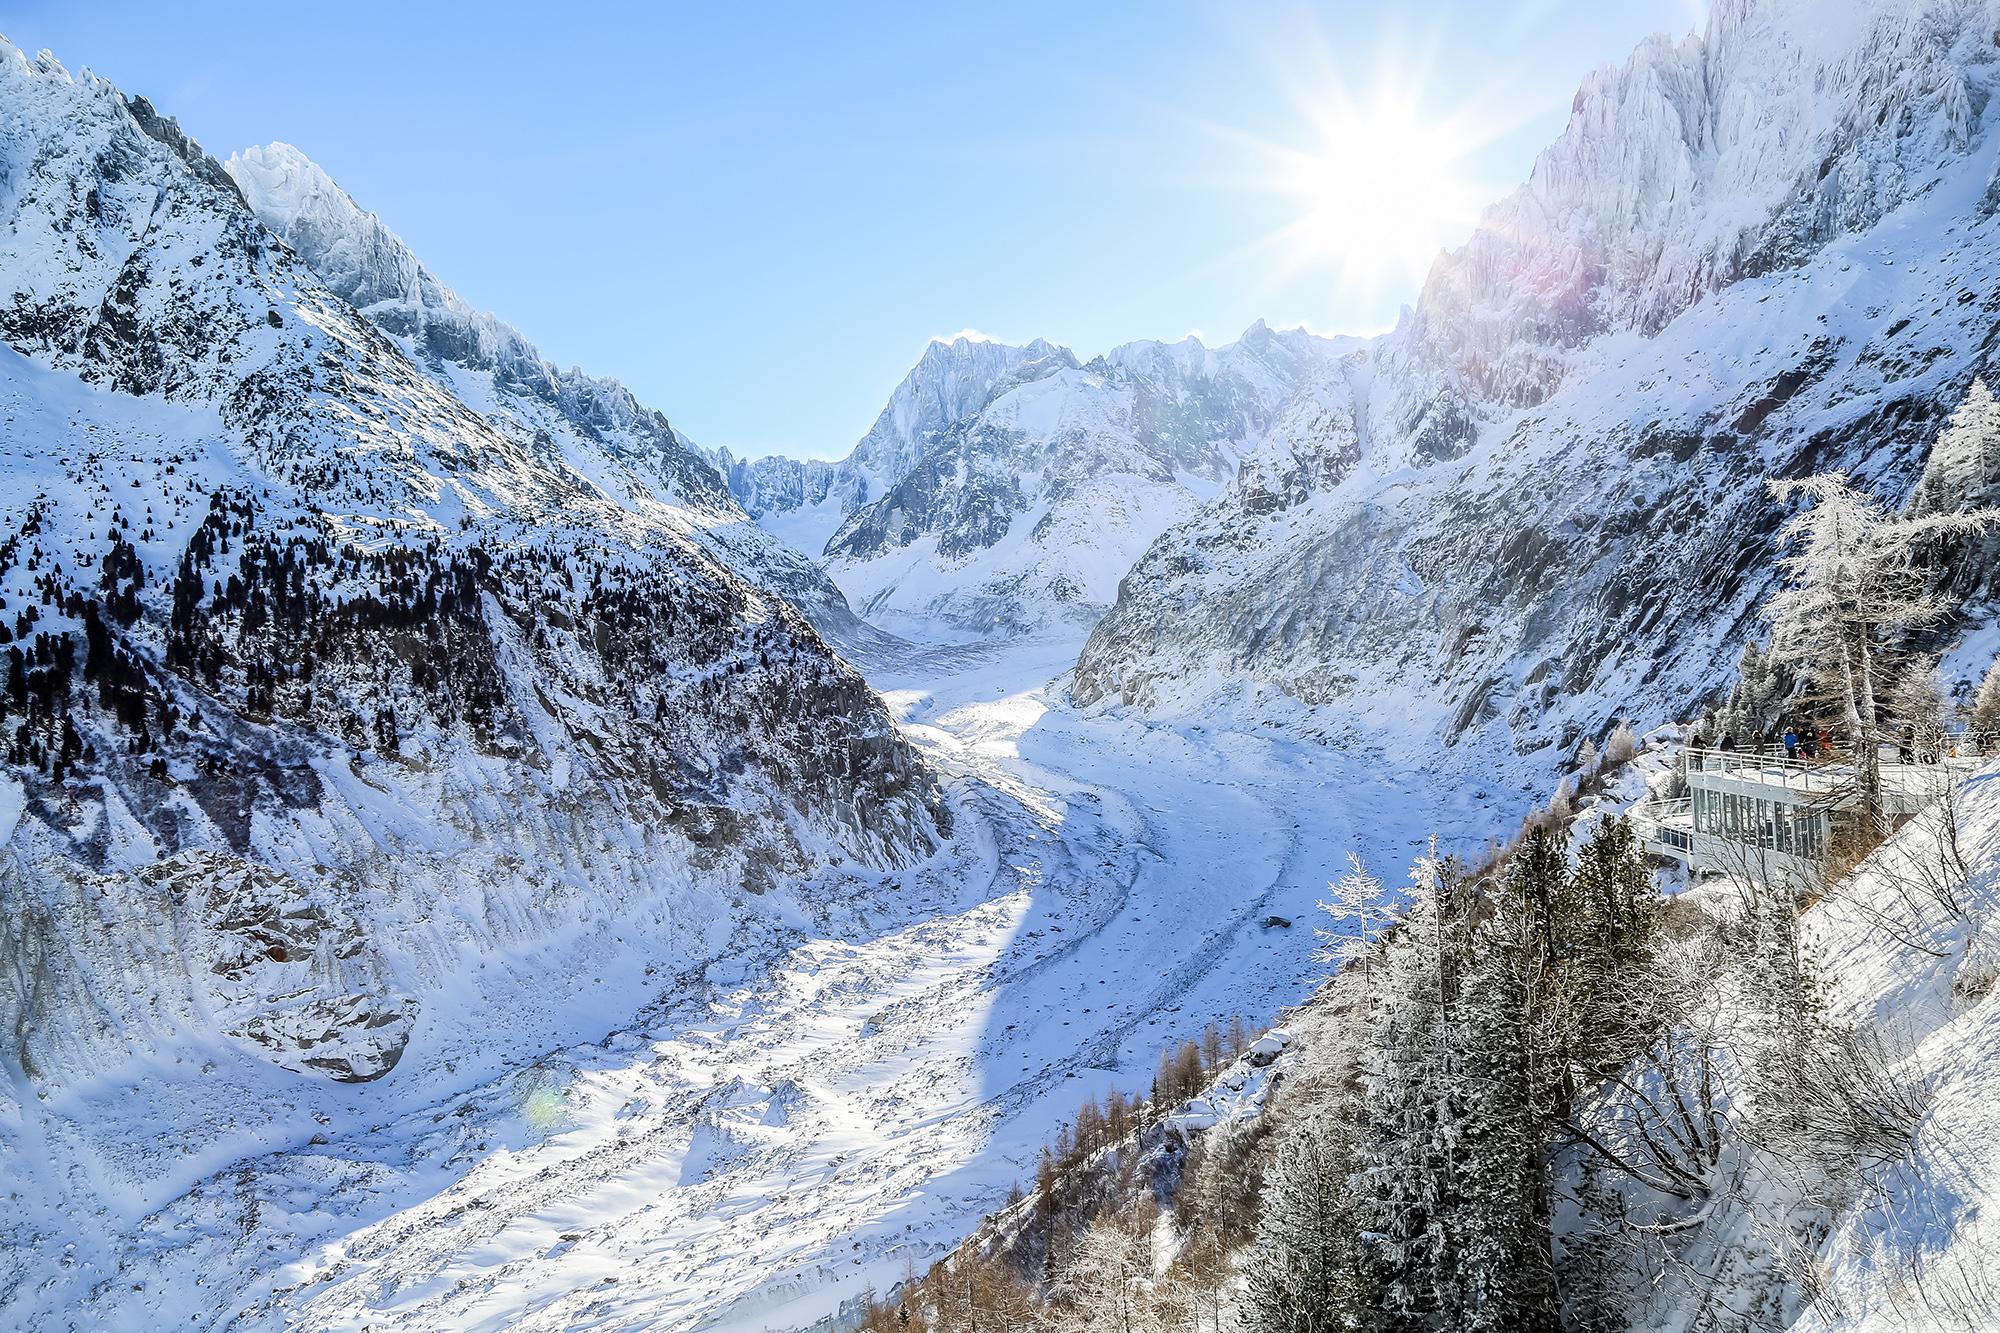 kt_2020_100_keytours_excursions_swisstours_chamonix_mont-blanc_mer_de_glace2_2048_10